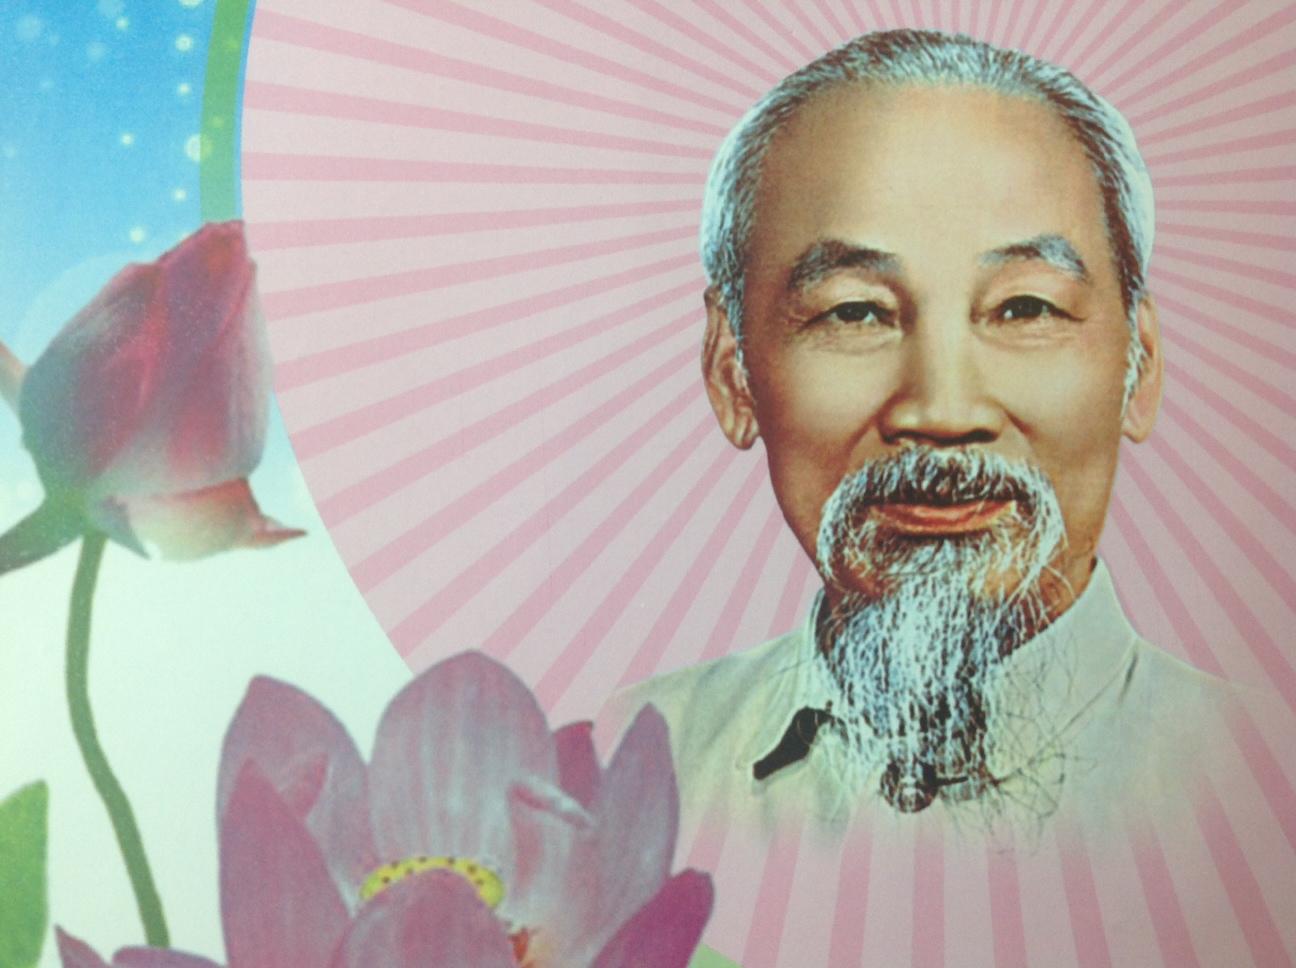 фото ЗакС политика В Петербурге появится памятник Хо Ши Мину